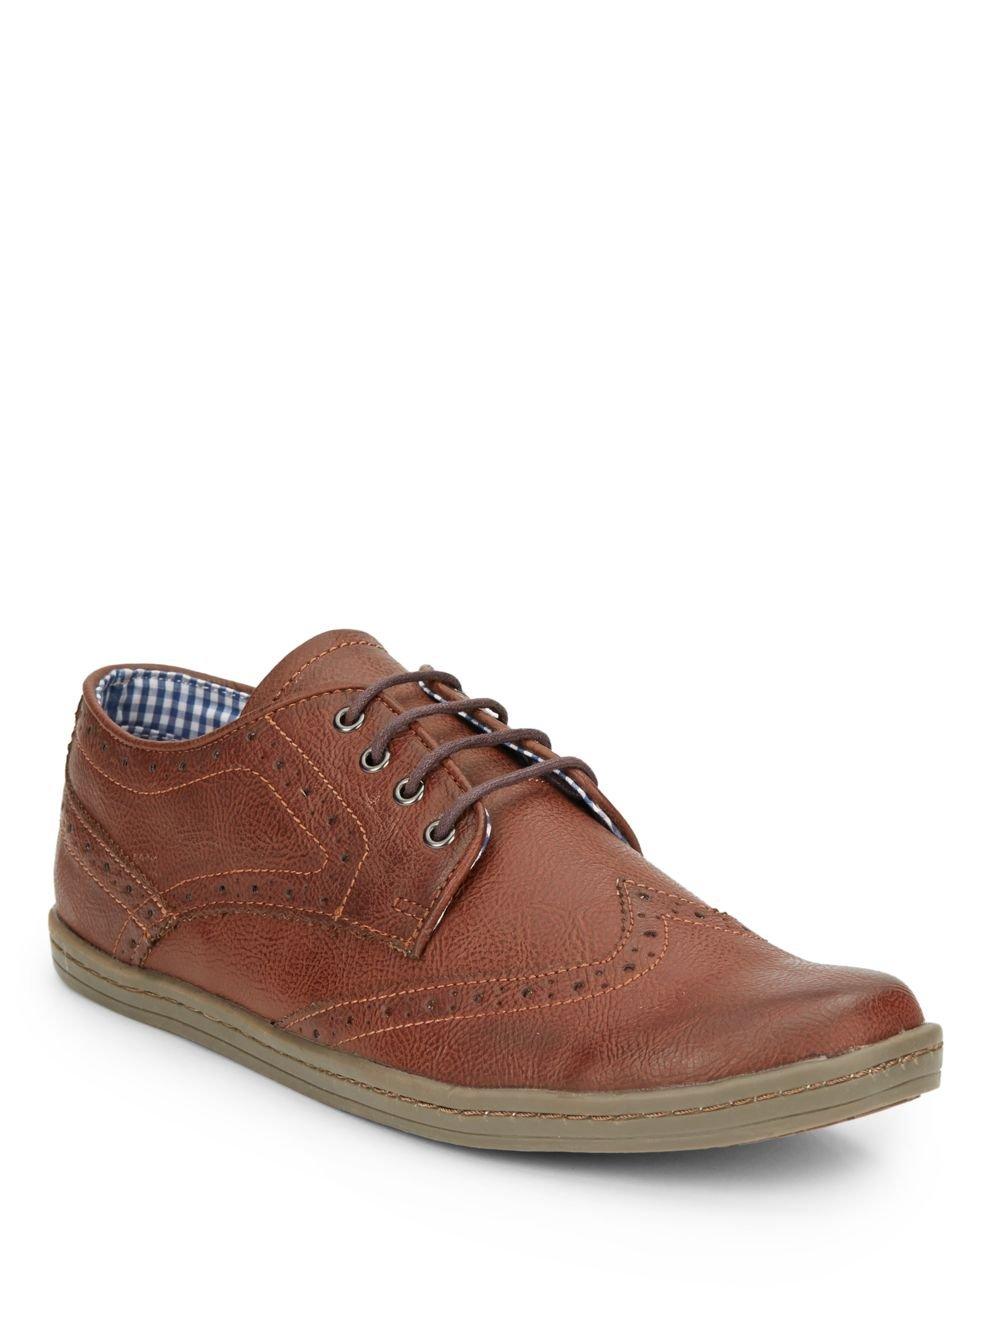 Ben Sherman Nick Faux Leather Brogue Sneakers In Cognac